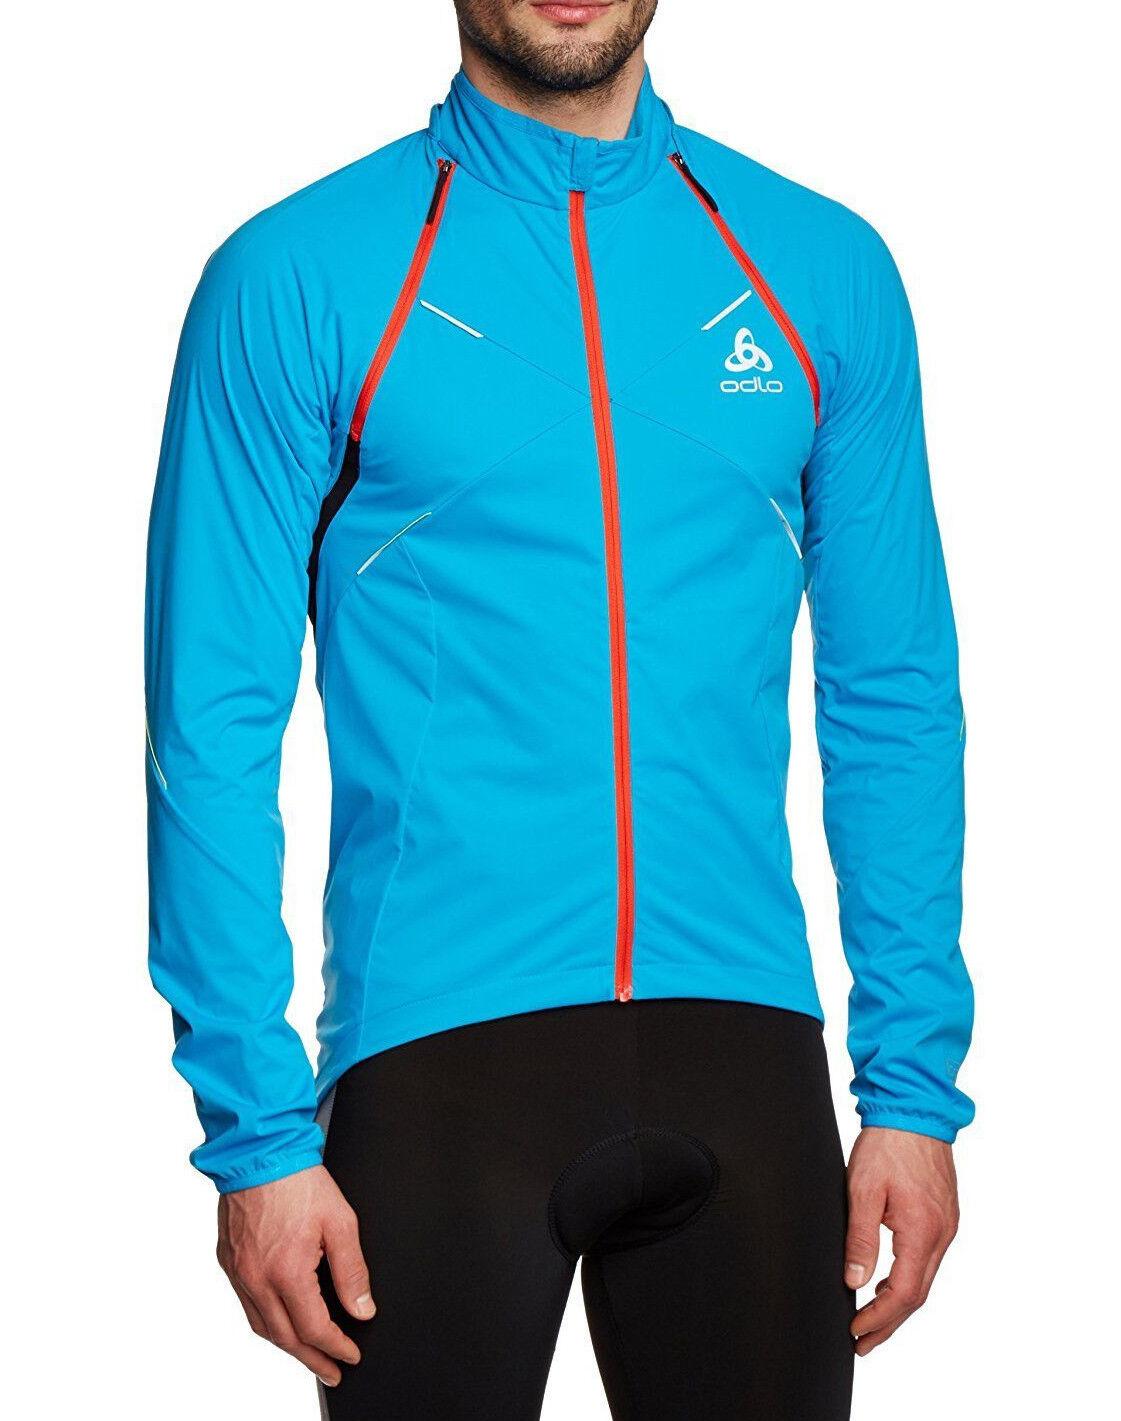 ODLO ODLO ODLO GIACCA UOMO [TG S] LOGIC Zip Off 410802 Blu Ciclismo Jogging Nuovo & OVP 813688